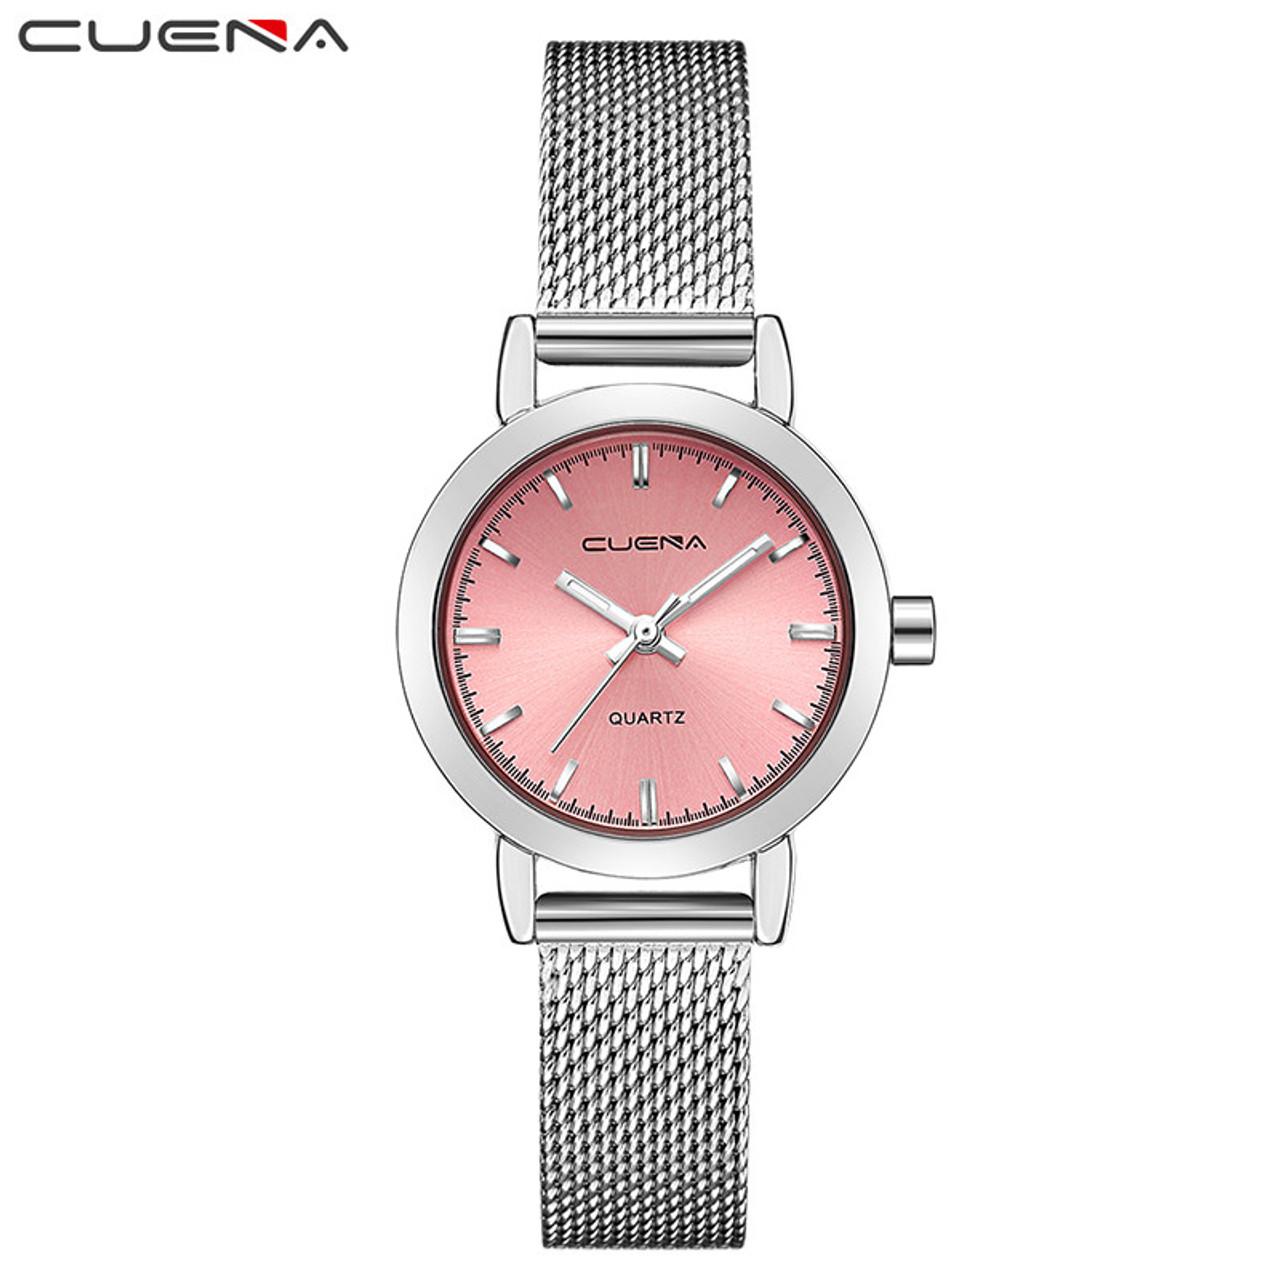 09b3e11ef3d ... Luxury Women Quartz Watch Fashion Ladies Watches Relojes Reloj Mujer  Montre Femme Relogio Feminino CUENA Brand ...